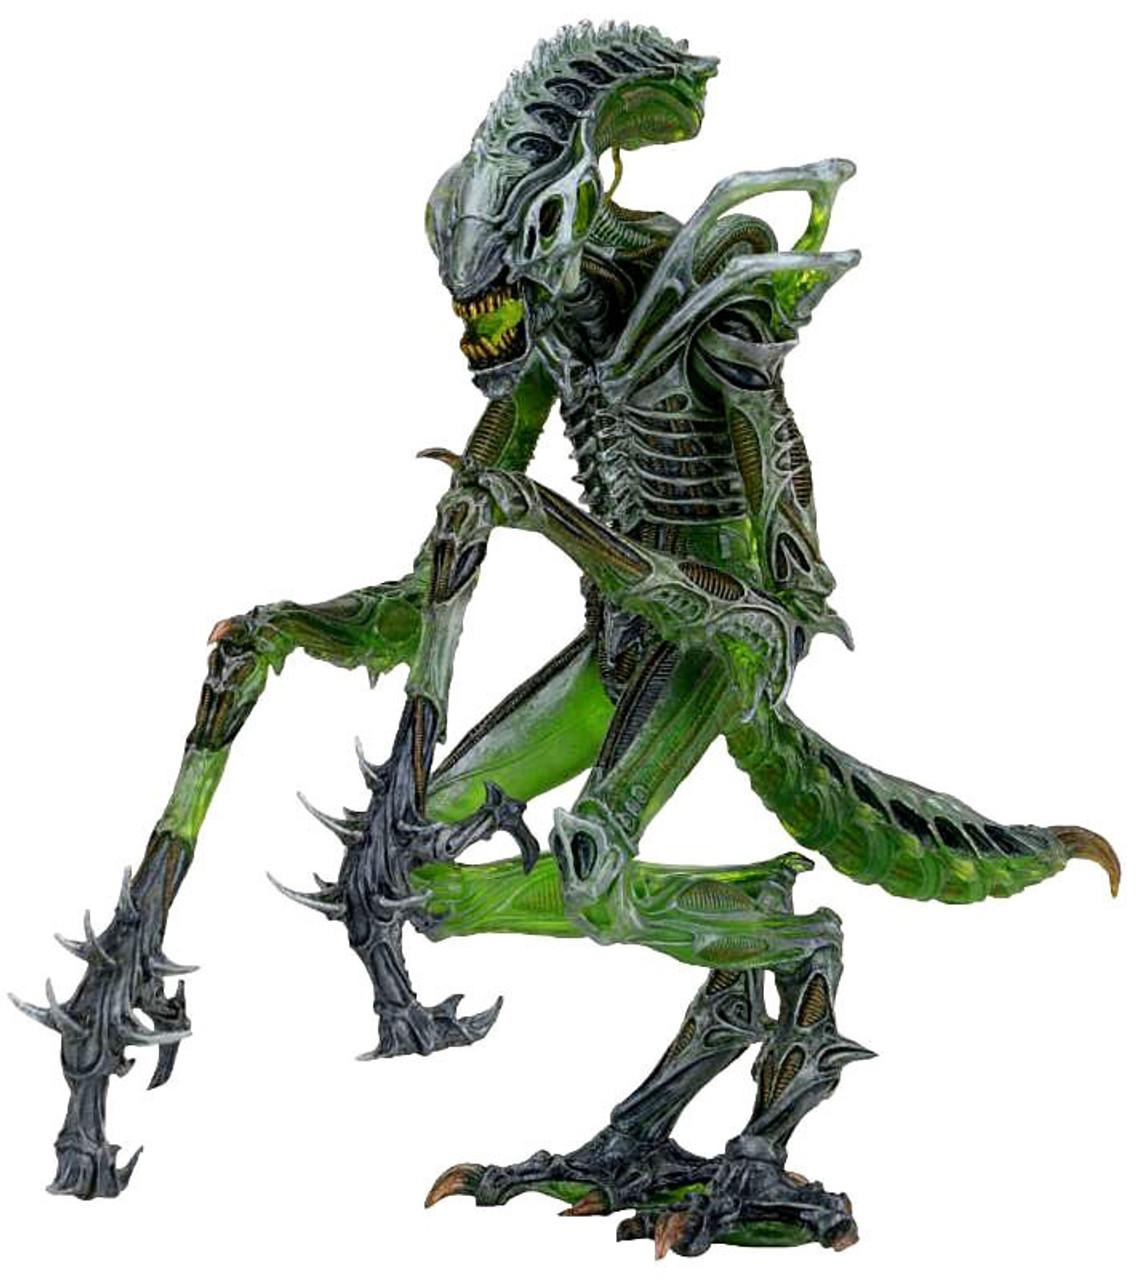 NECA Aliens Series 10 Mantis Action Figure